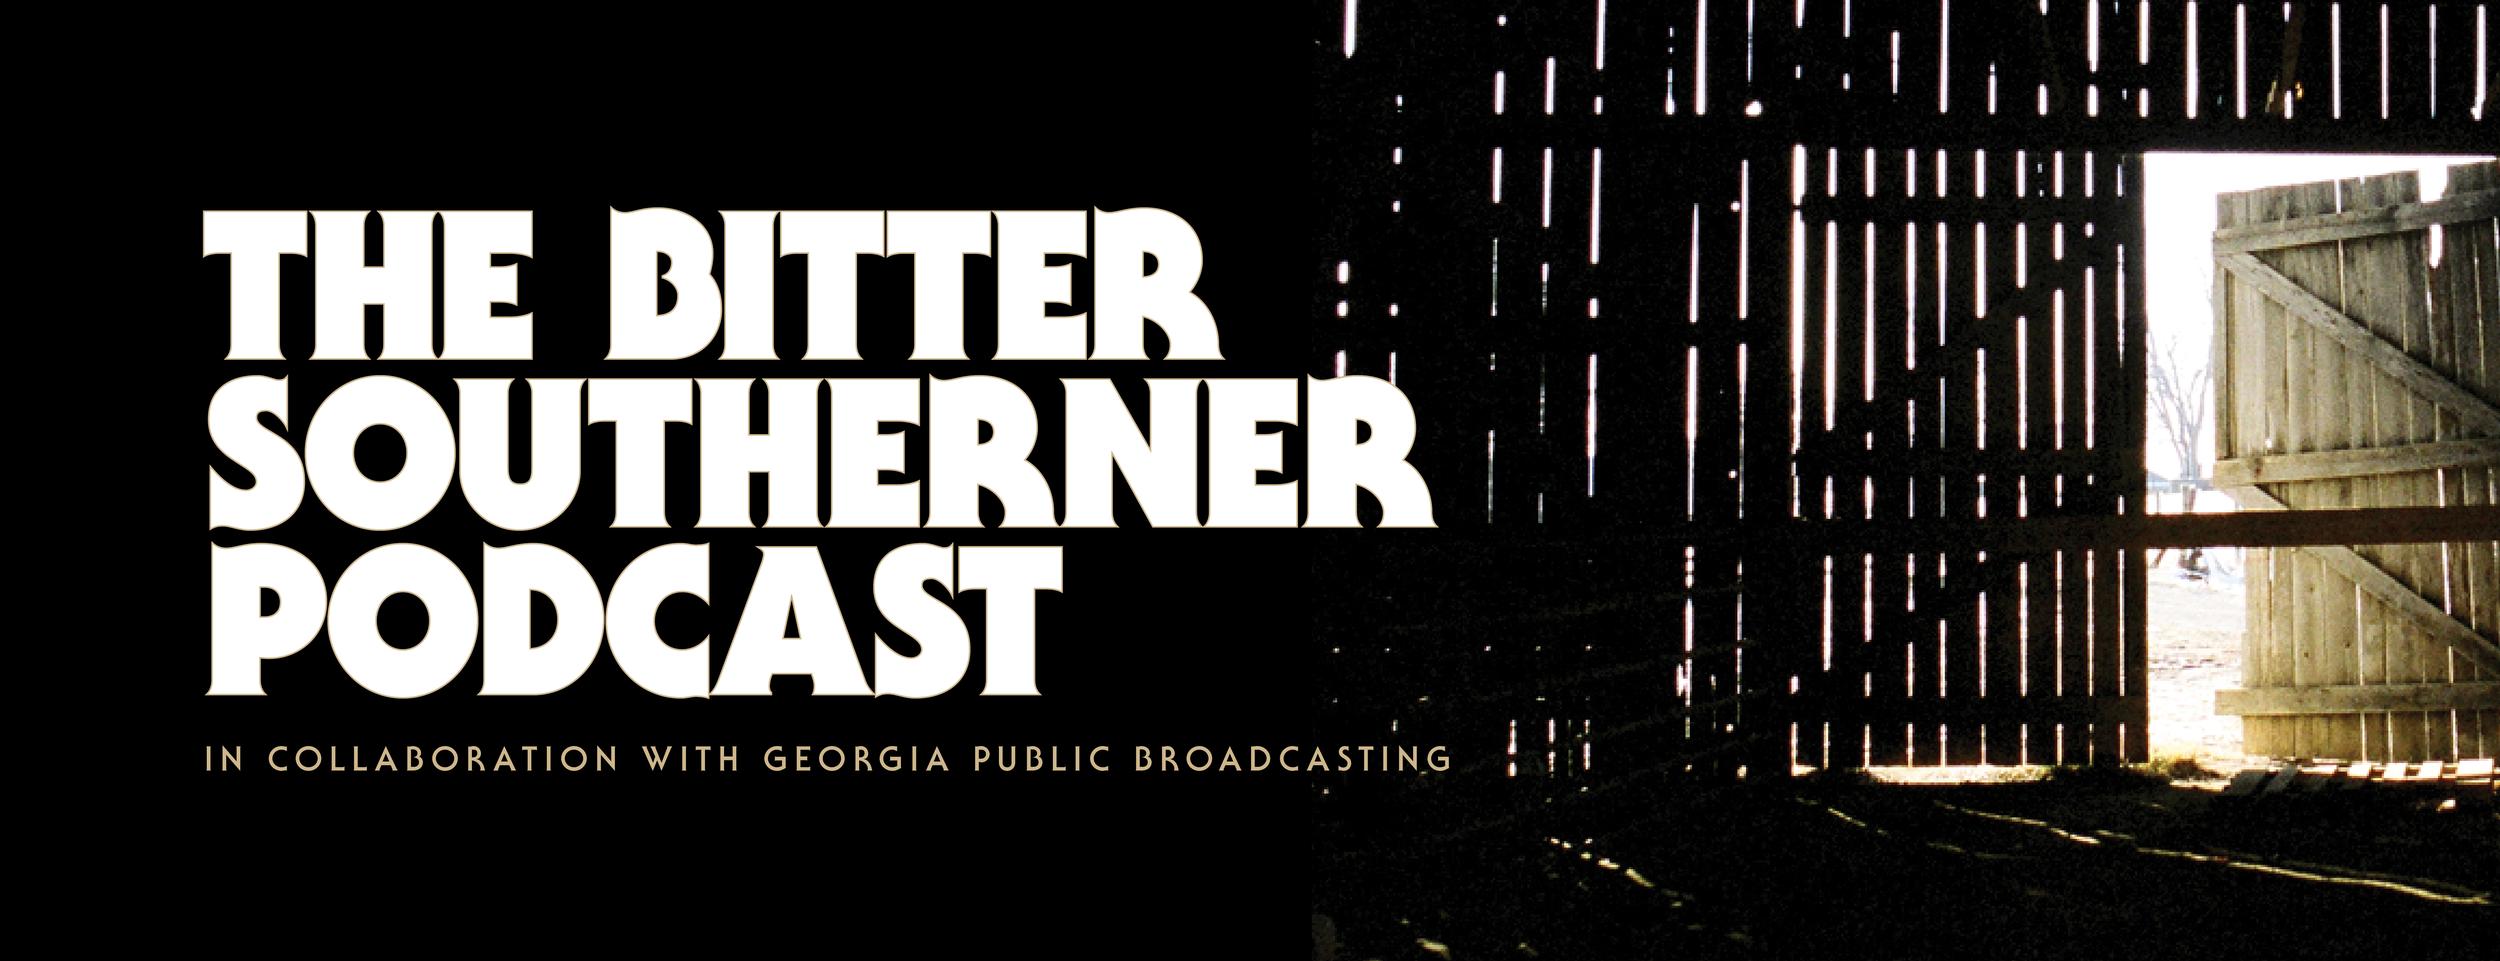 bs-podcast-header-2.png